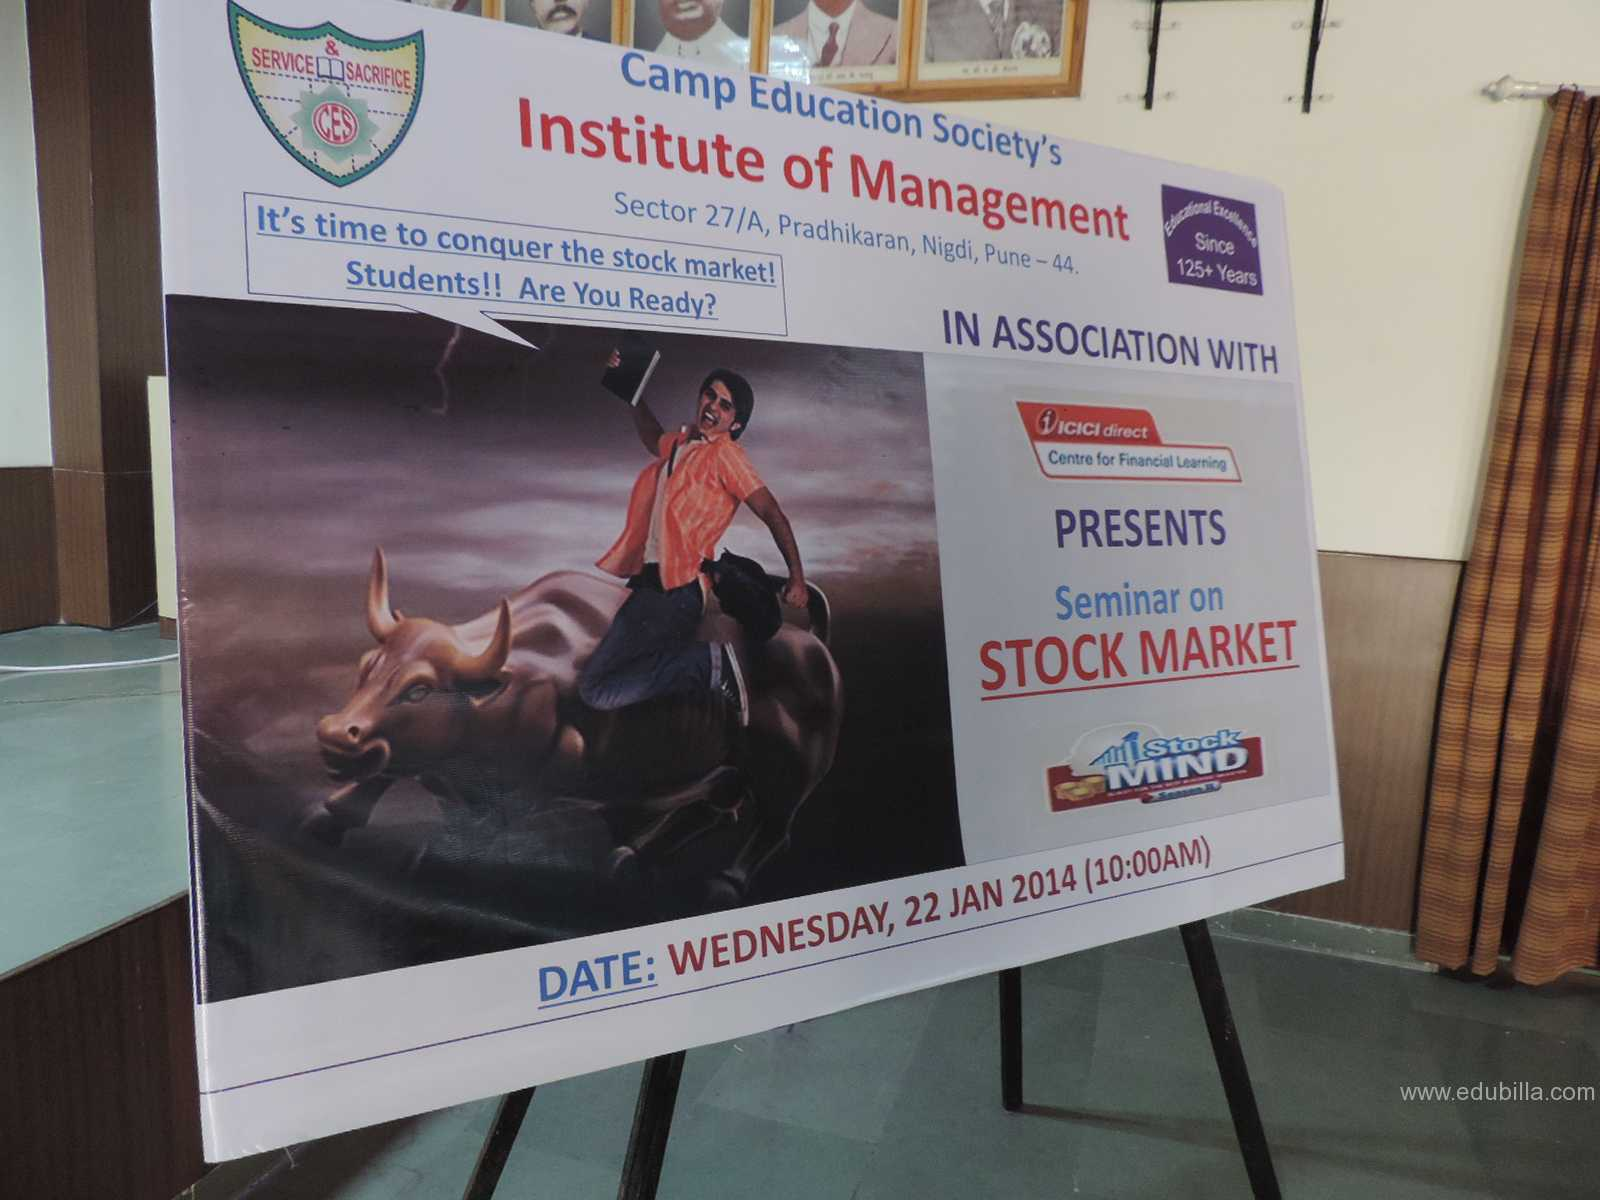 Seminar on Stock Market